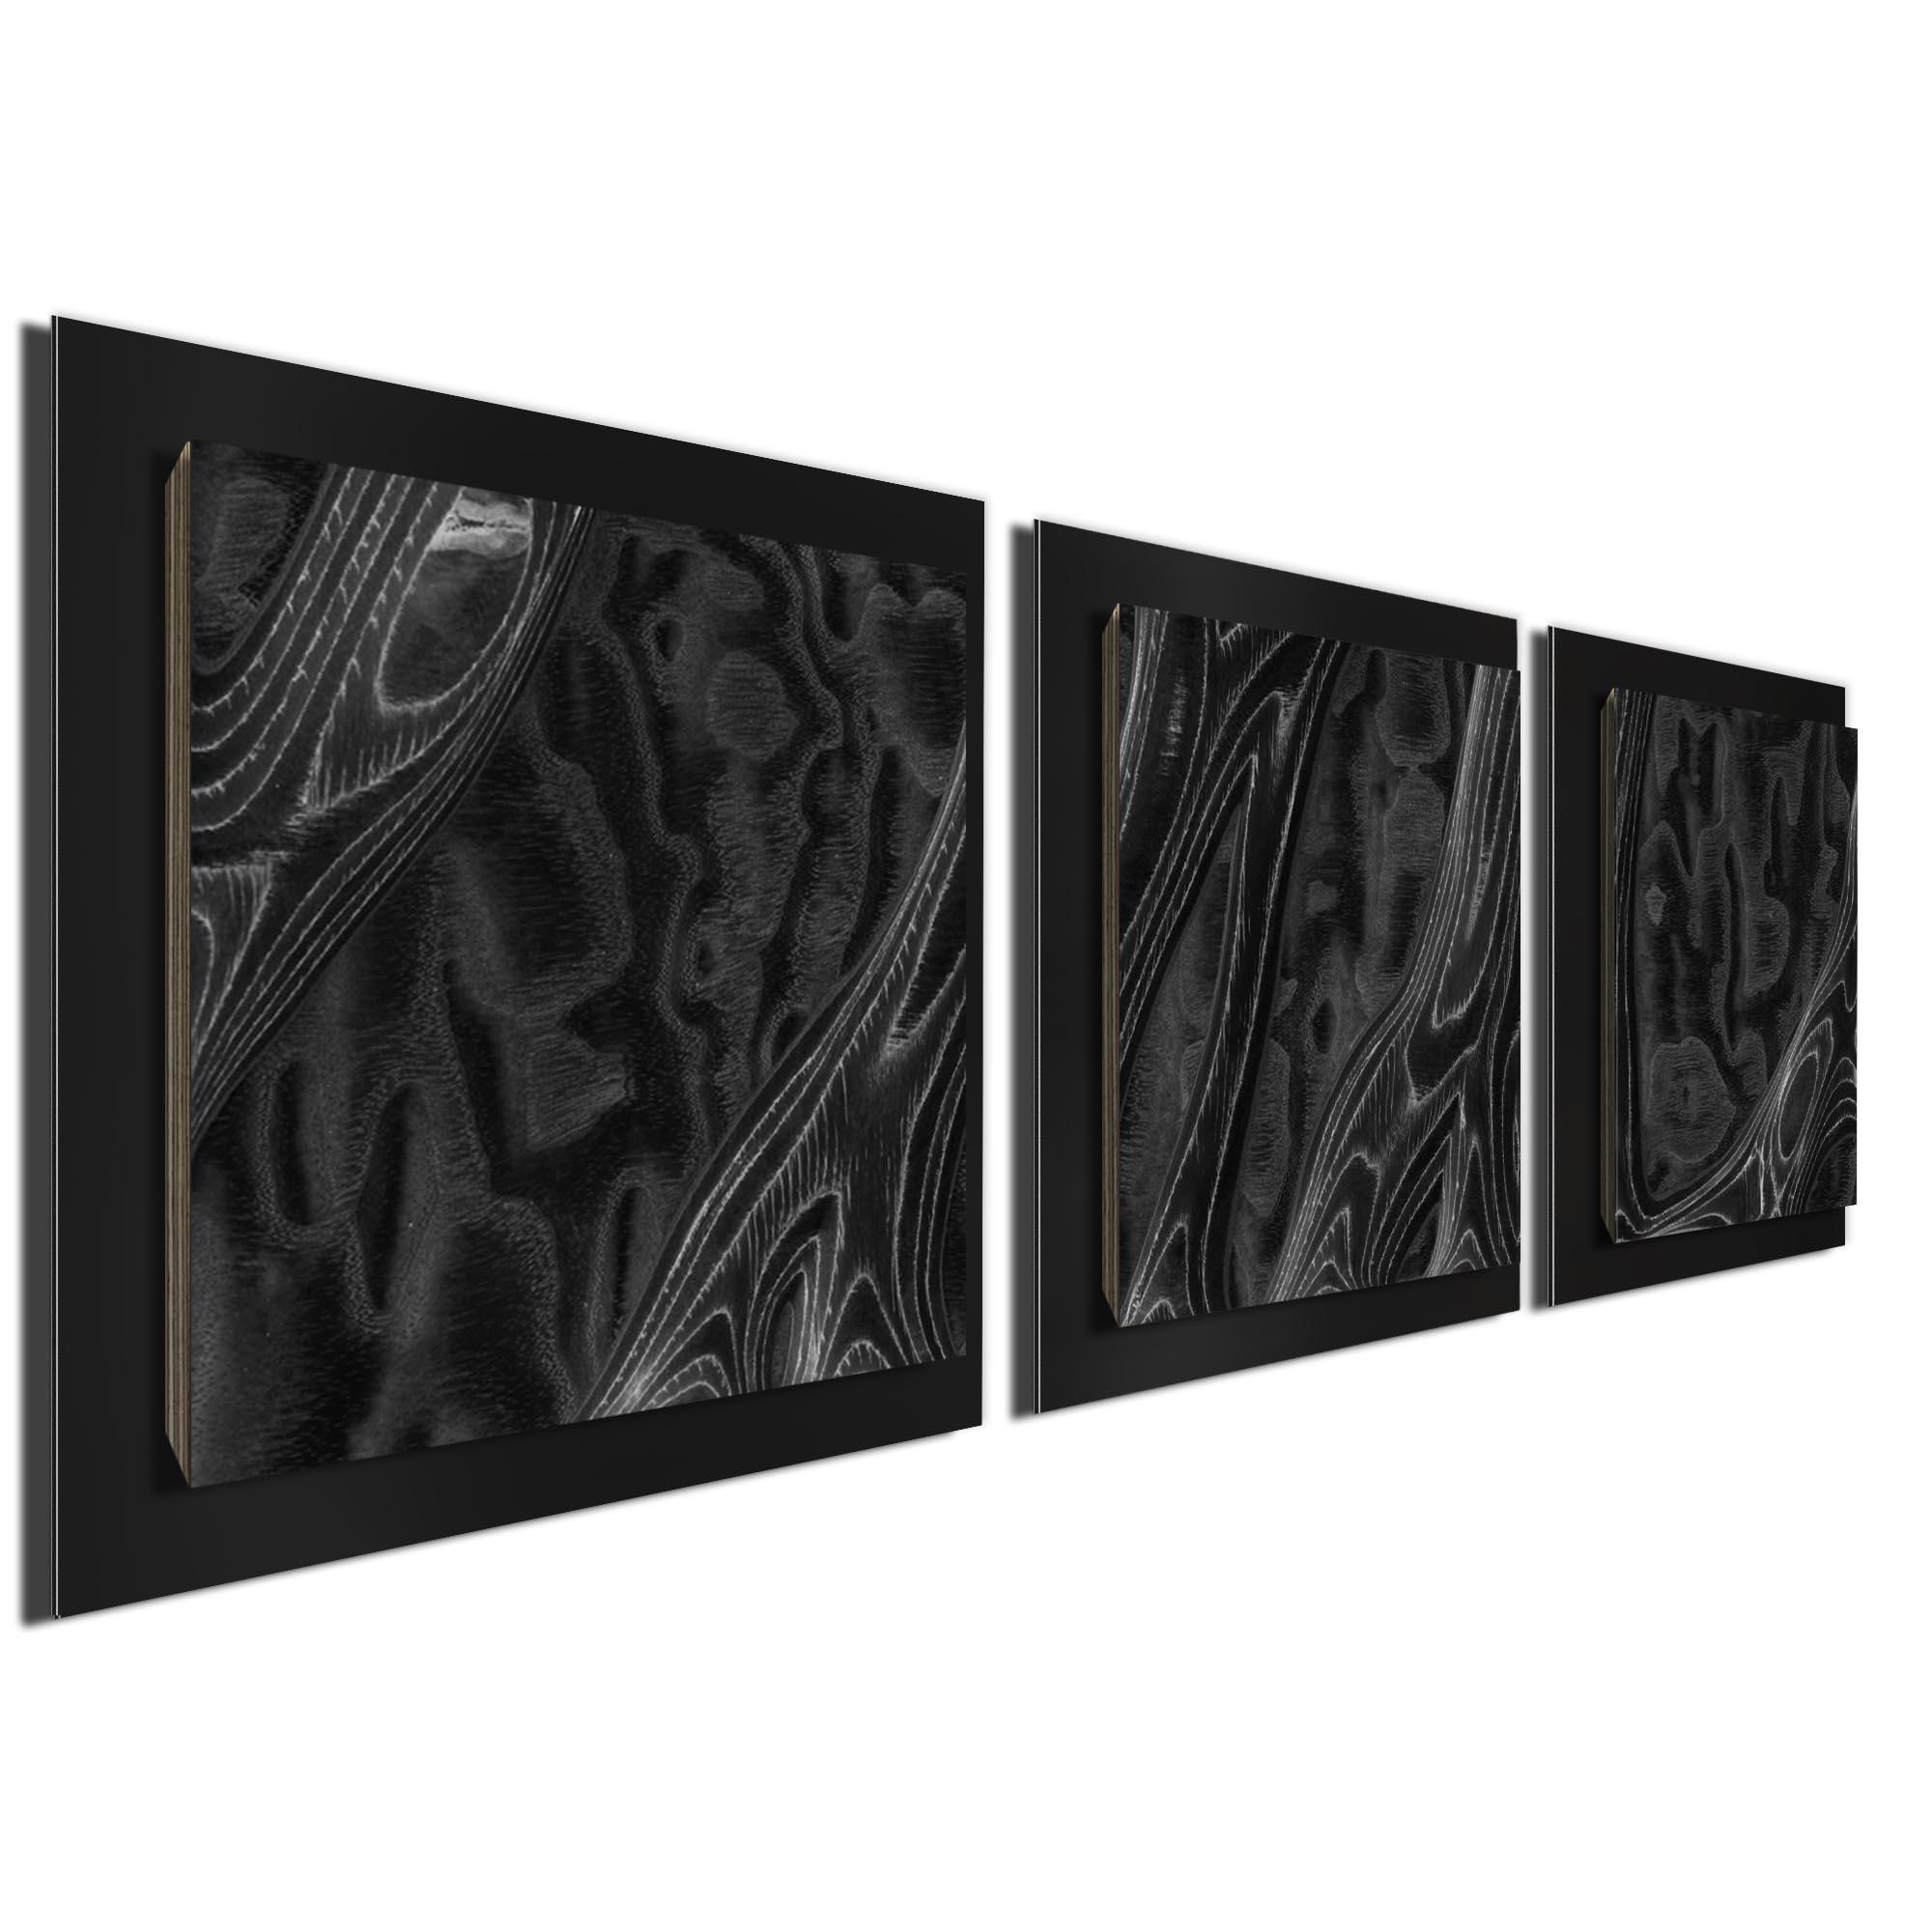 Ebony Burl Essence Black by Jackson Wright Rustic Modern Style Wood Wall Art - Image 2